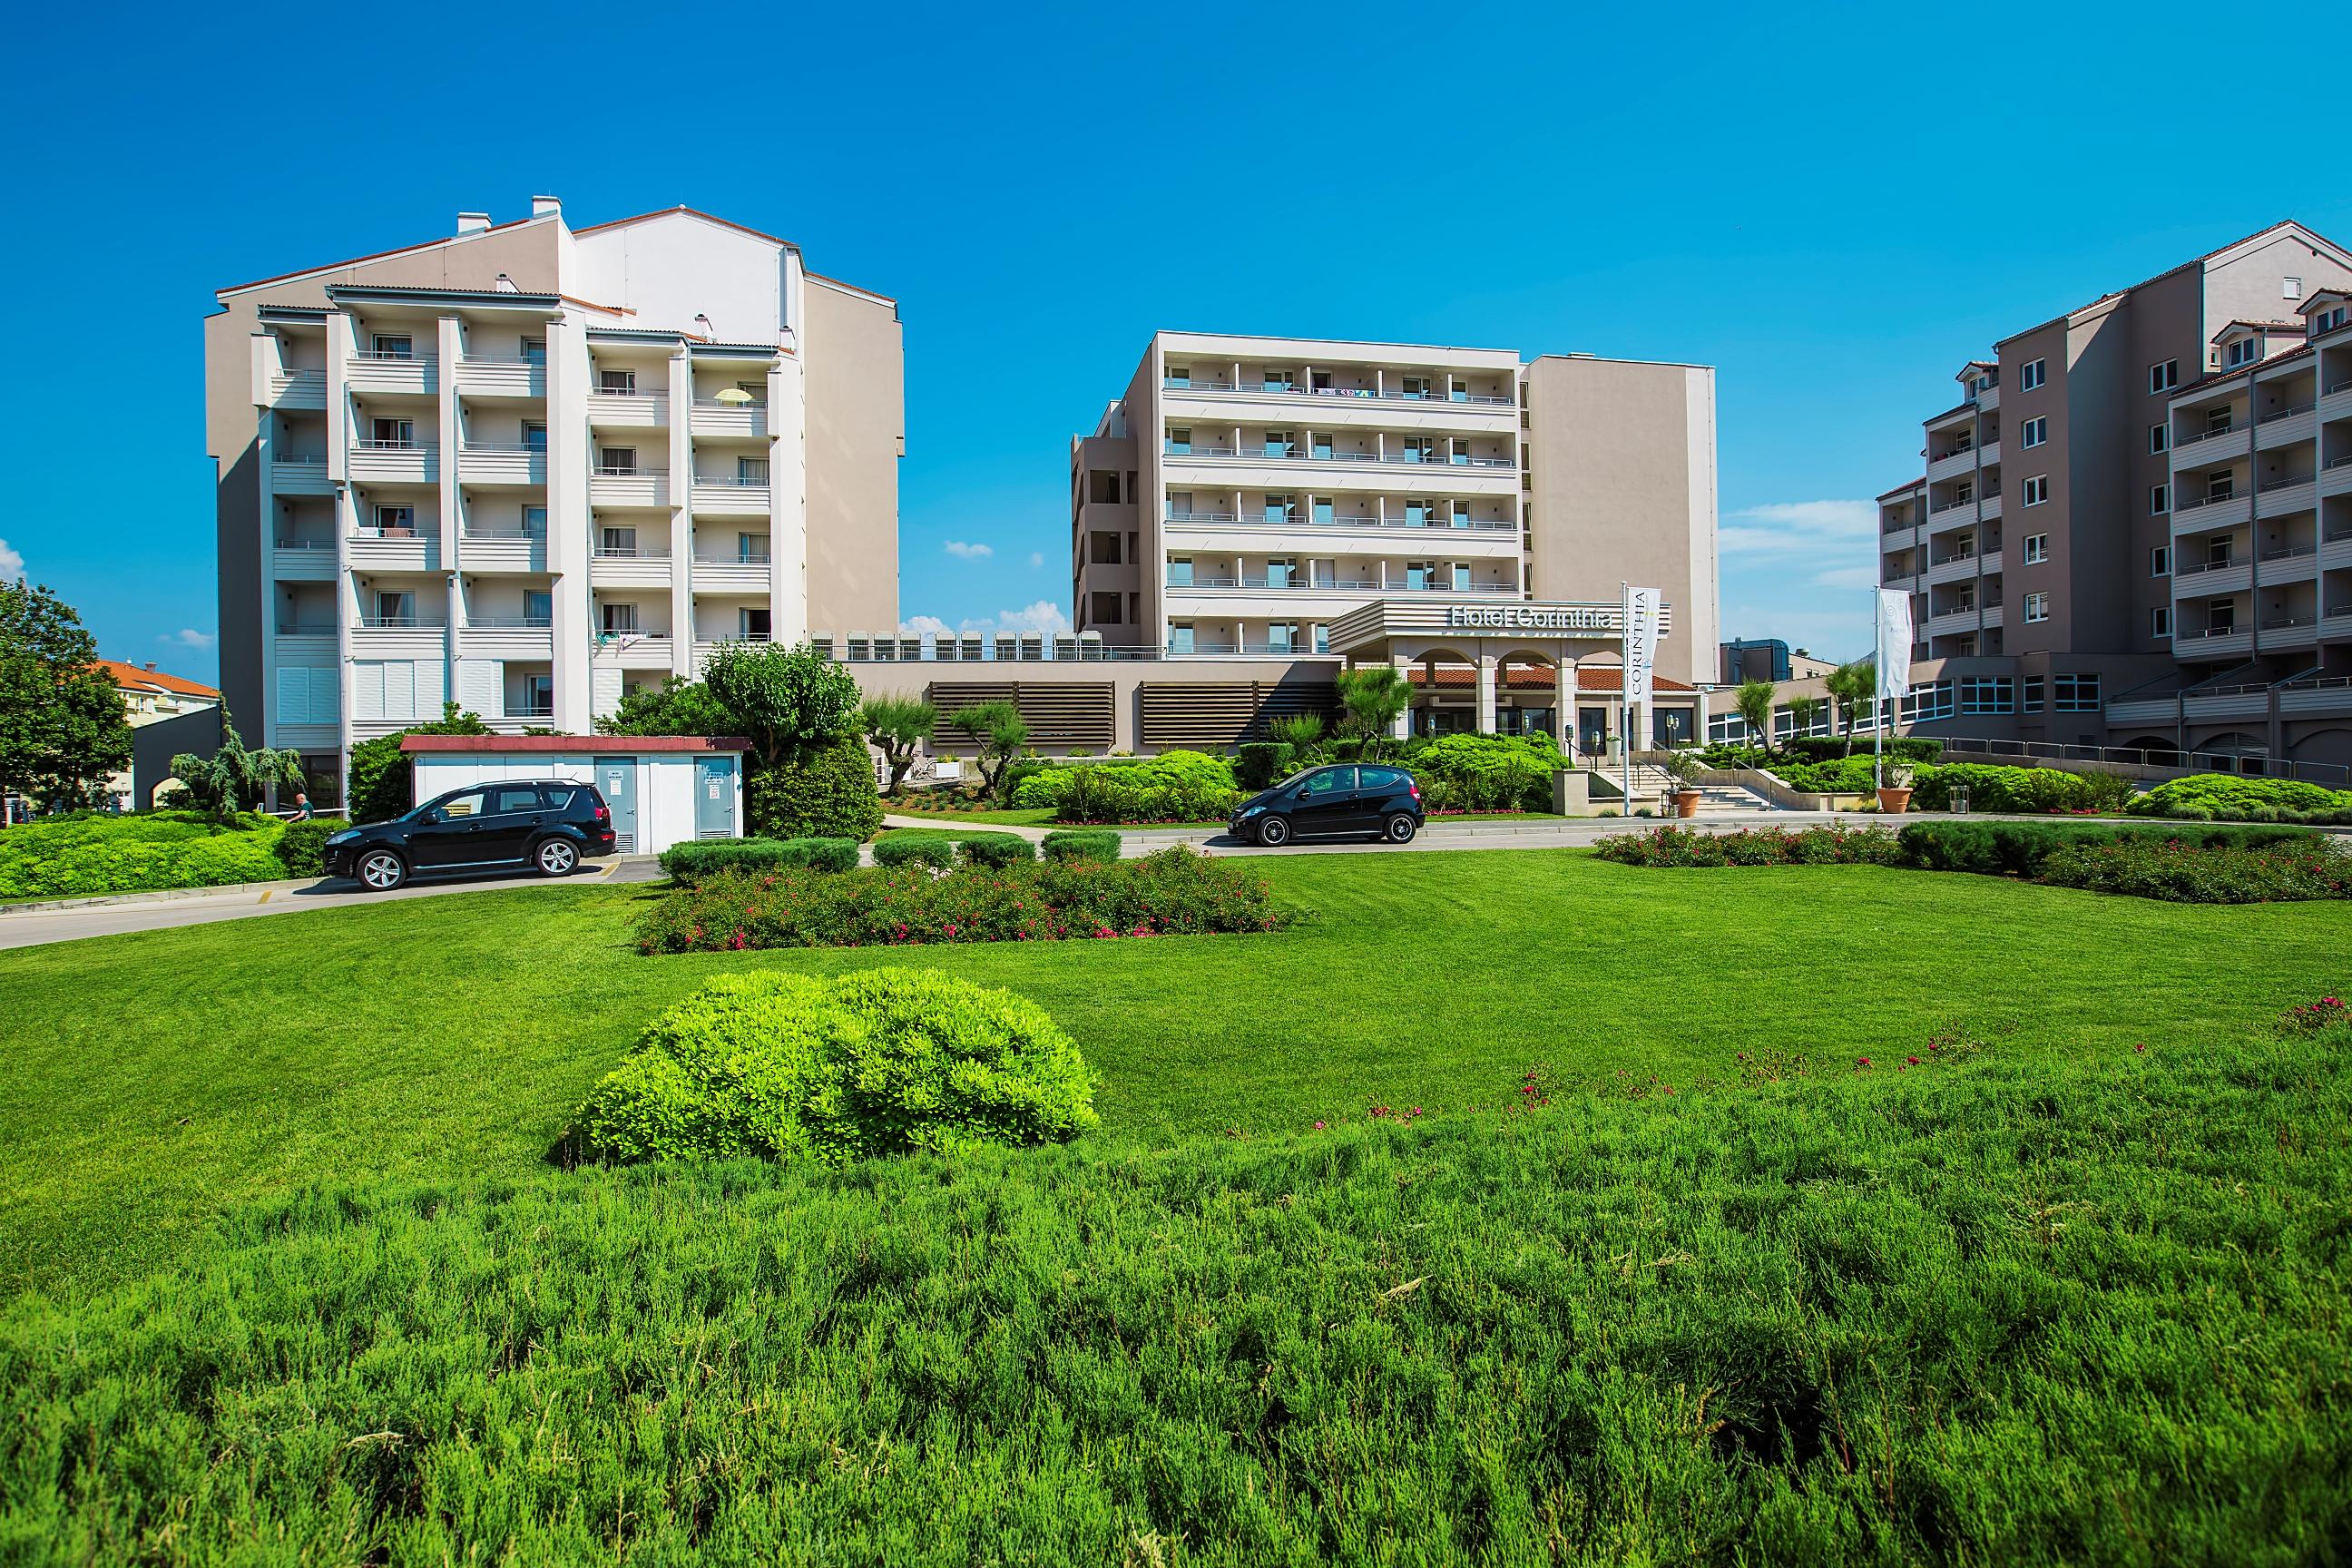 Hotel_Corinthia_-_Baška_30